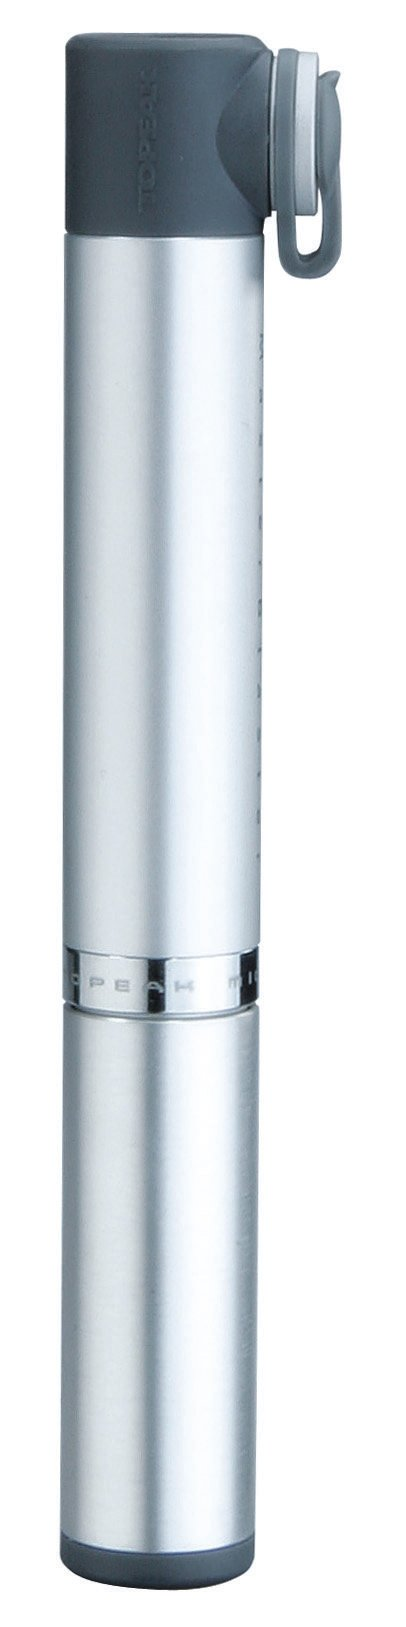 Topeak Micro Rocket AL MasterBlaster Aluminum Bike Pump product image